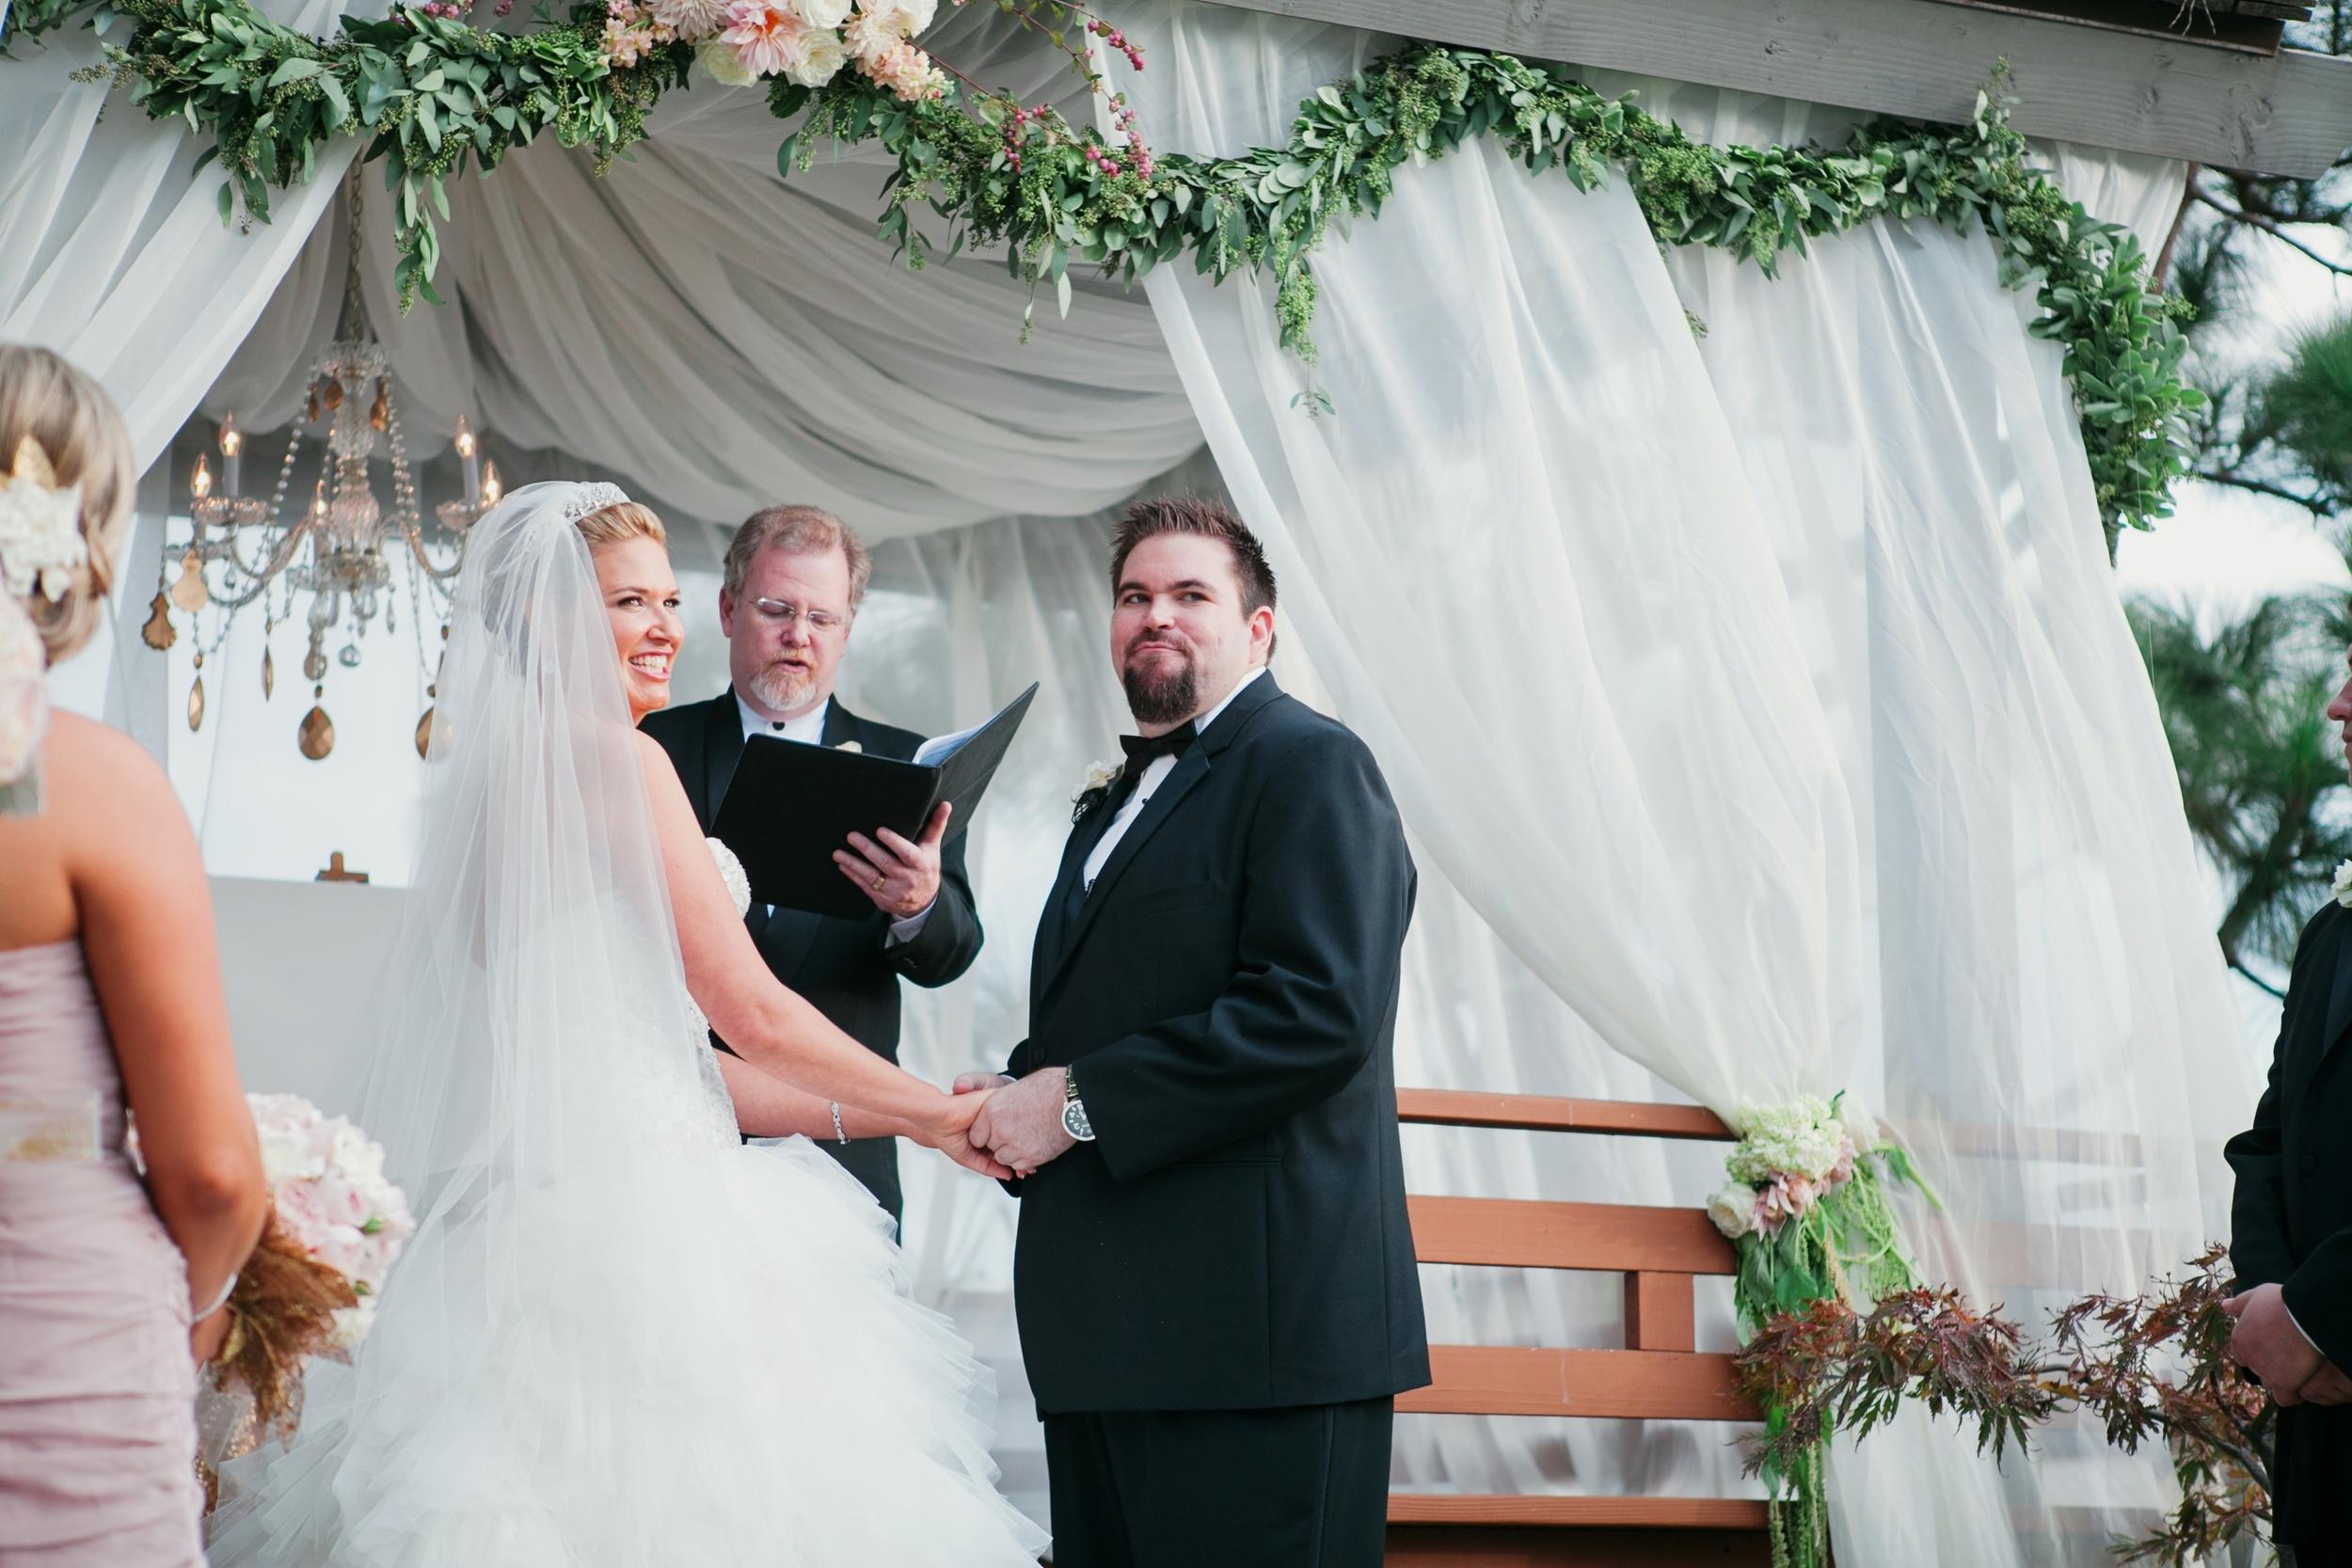 The-Suitcase-Studio-Timree-Matt-Lifestyle-Wedding-Photographer-042.jpg